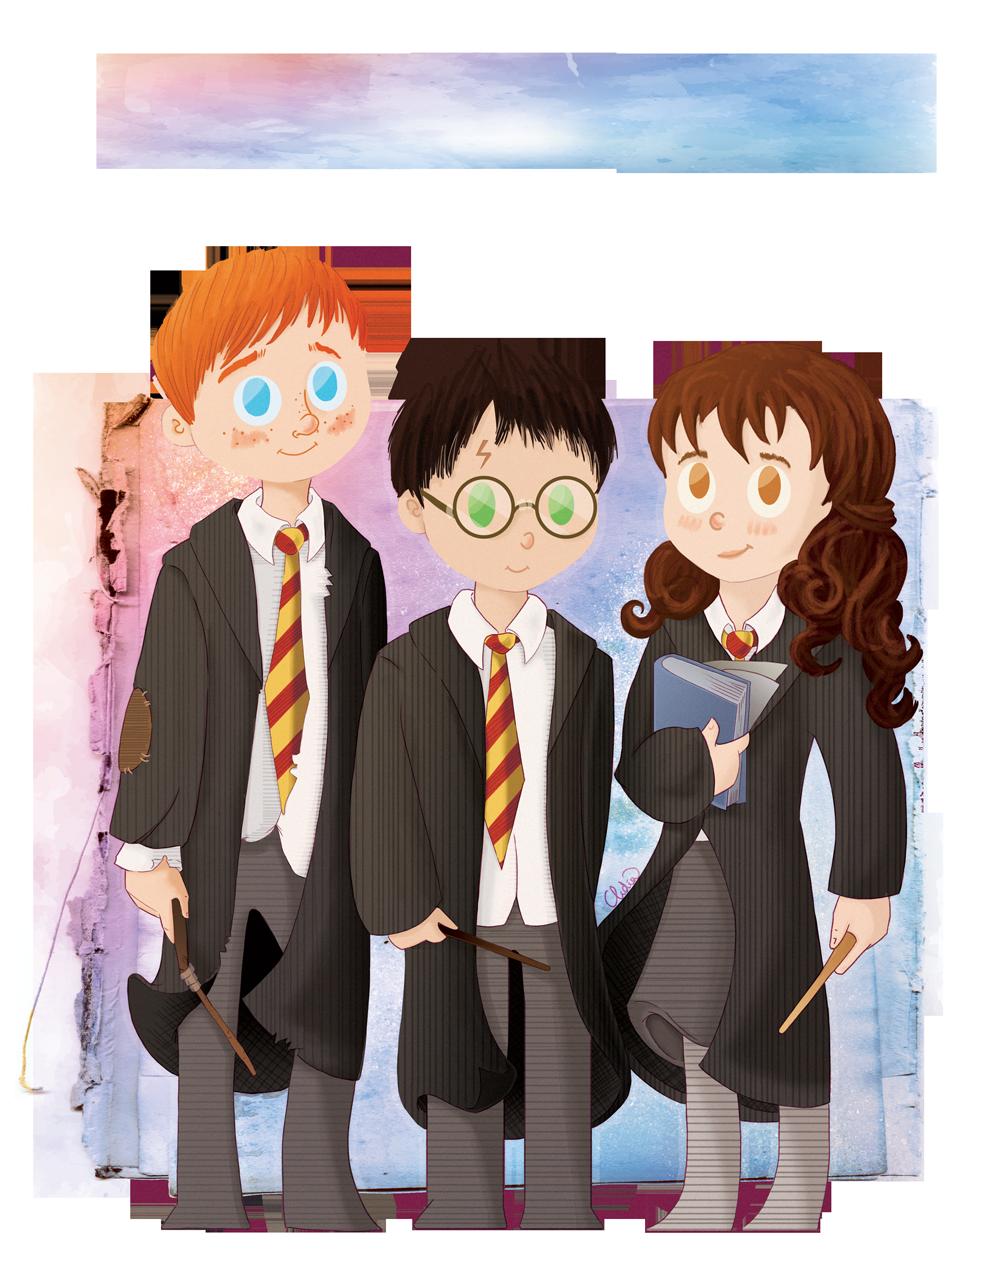 magic trio by Lizeeeee